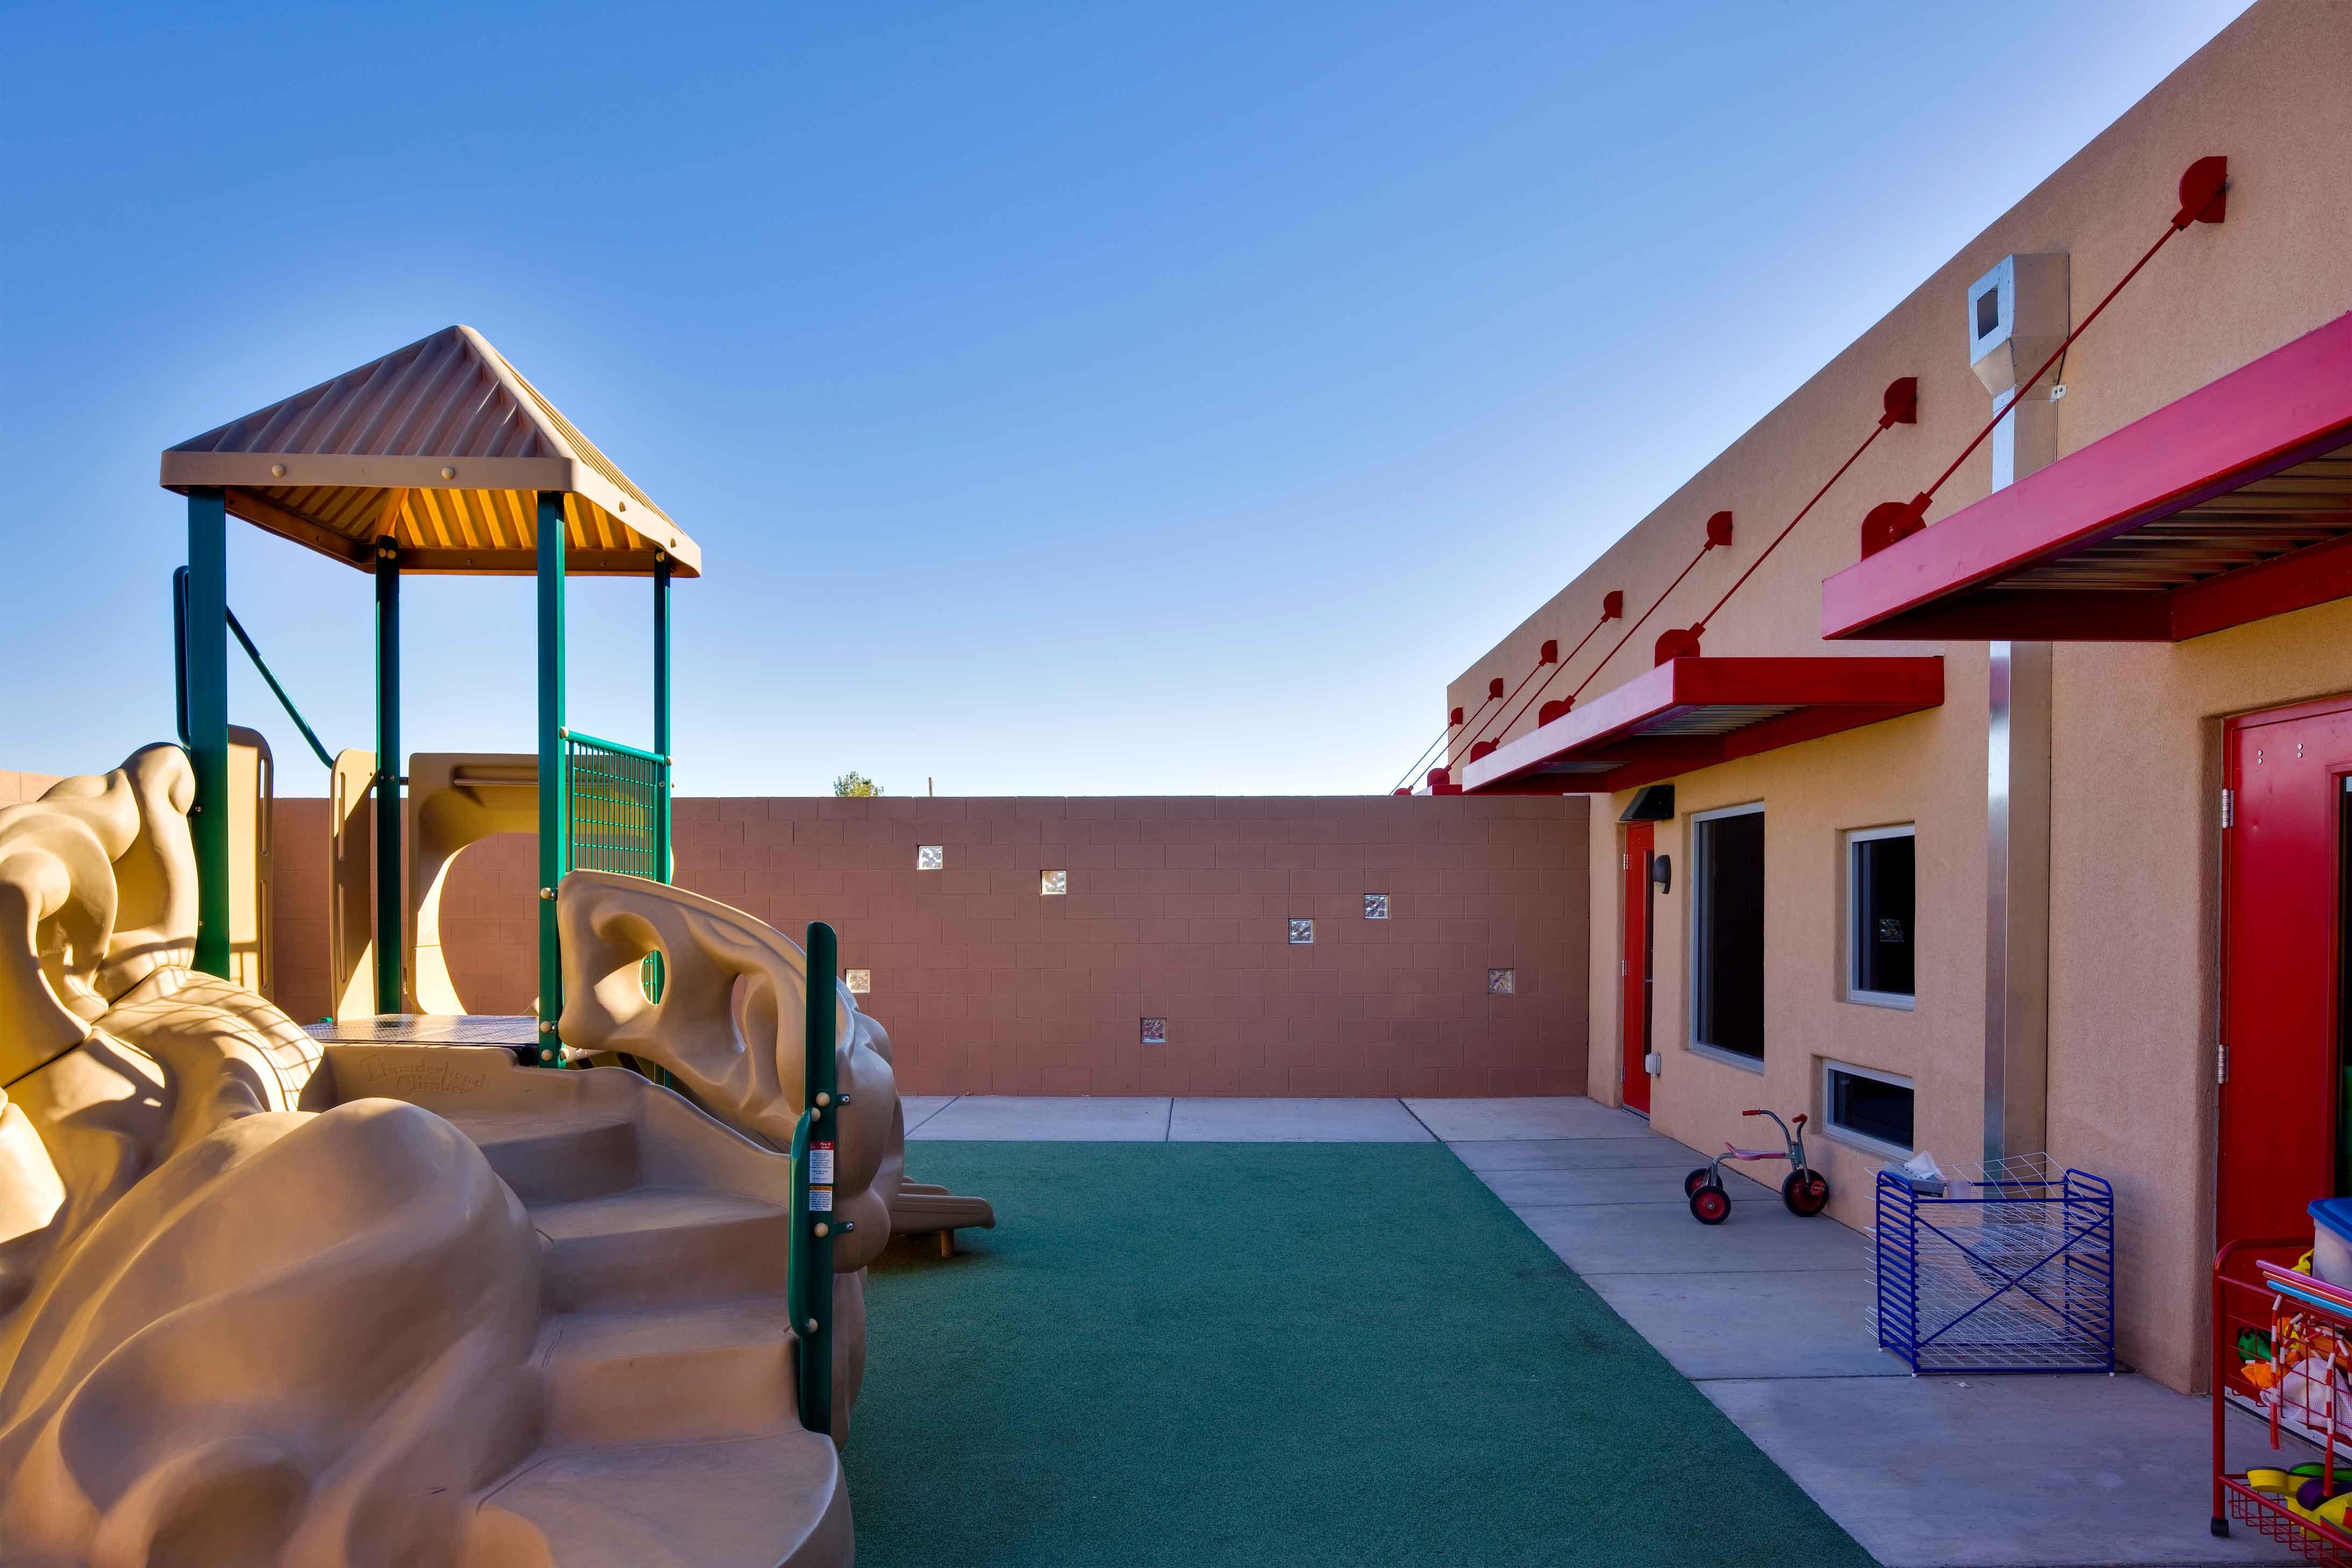 luna-county-daycare